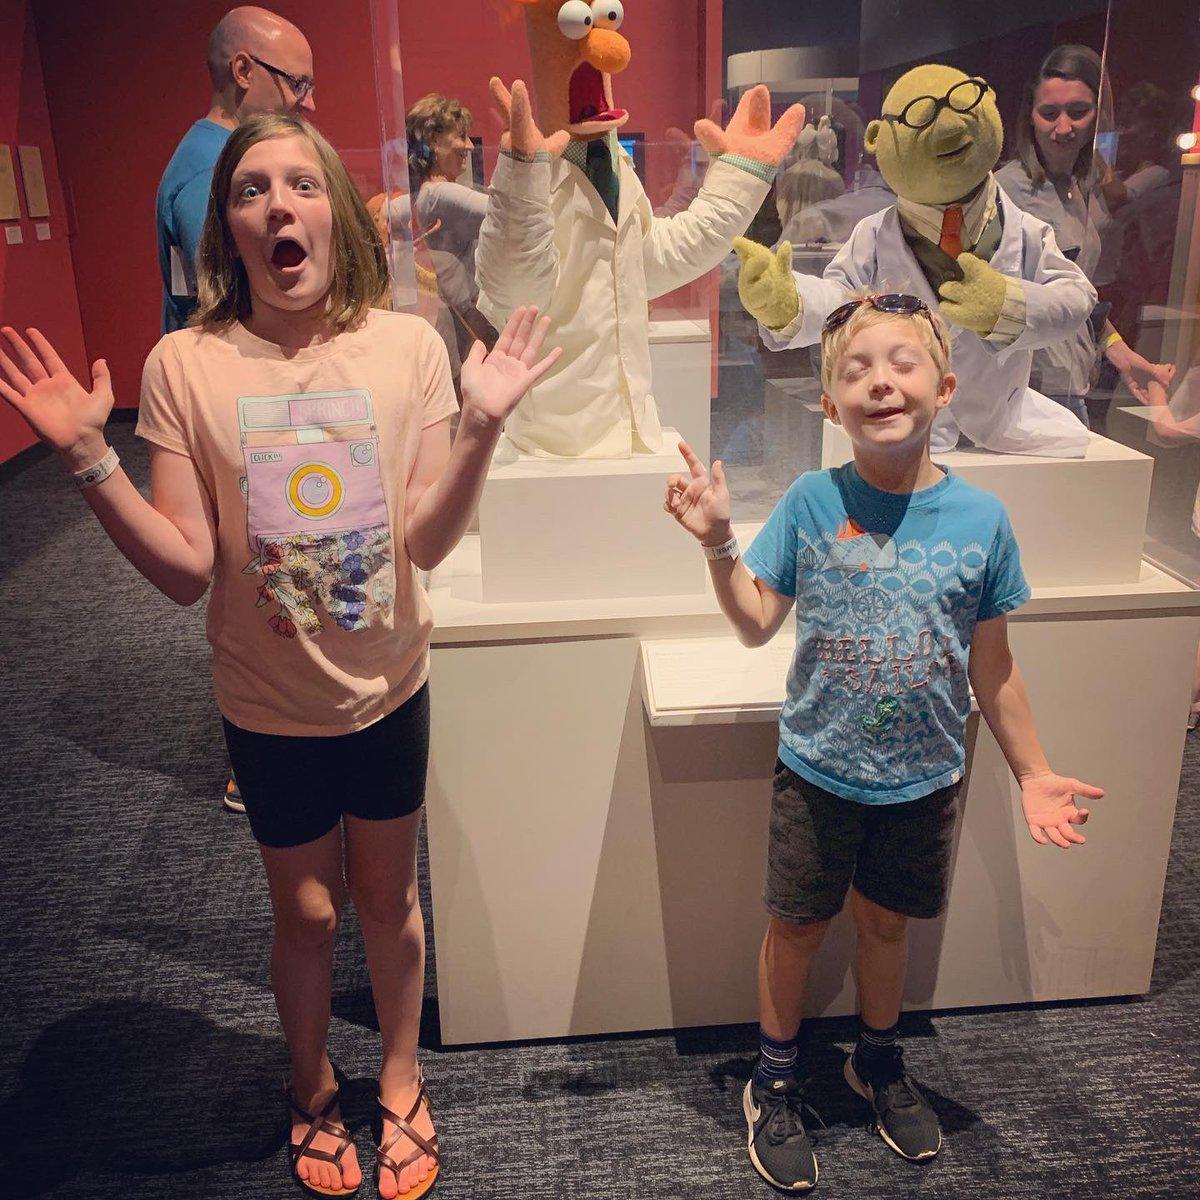 My kids as Bunsen & Beaker / Bert & Ernie. Today's adventure @COSI. #jimhenson 💗💗💗